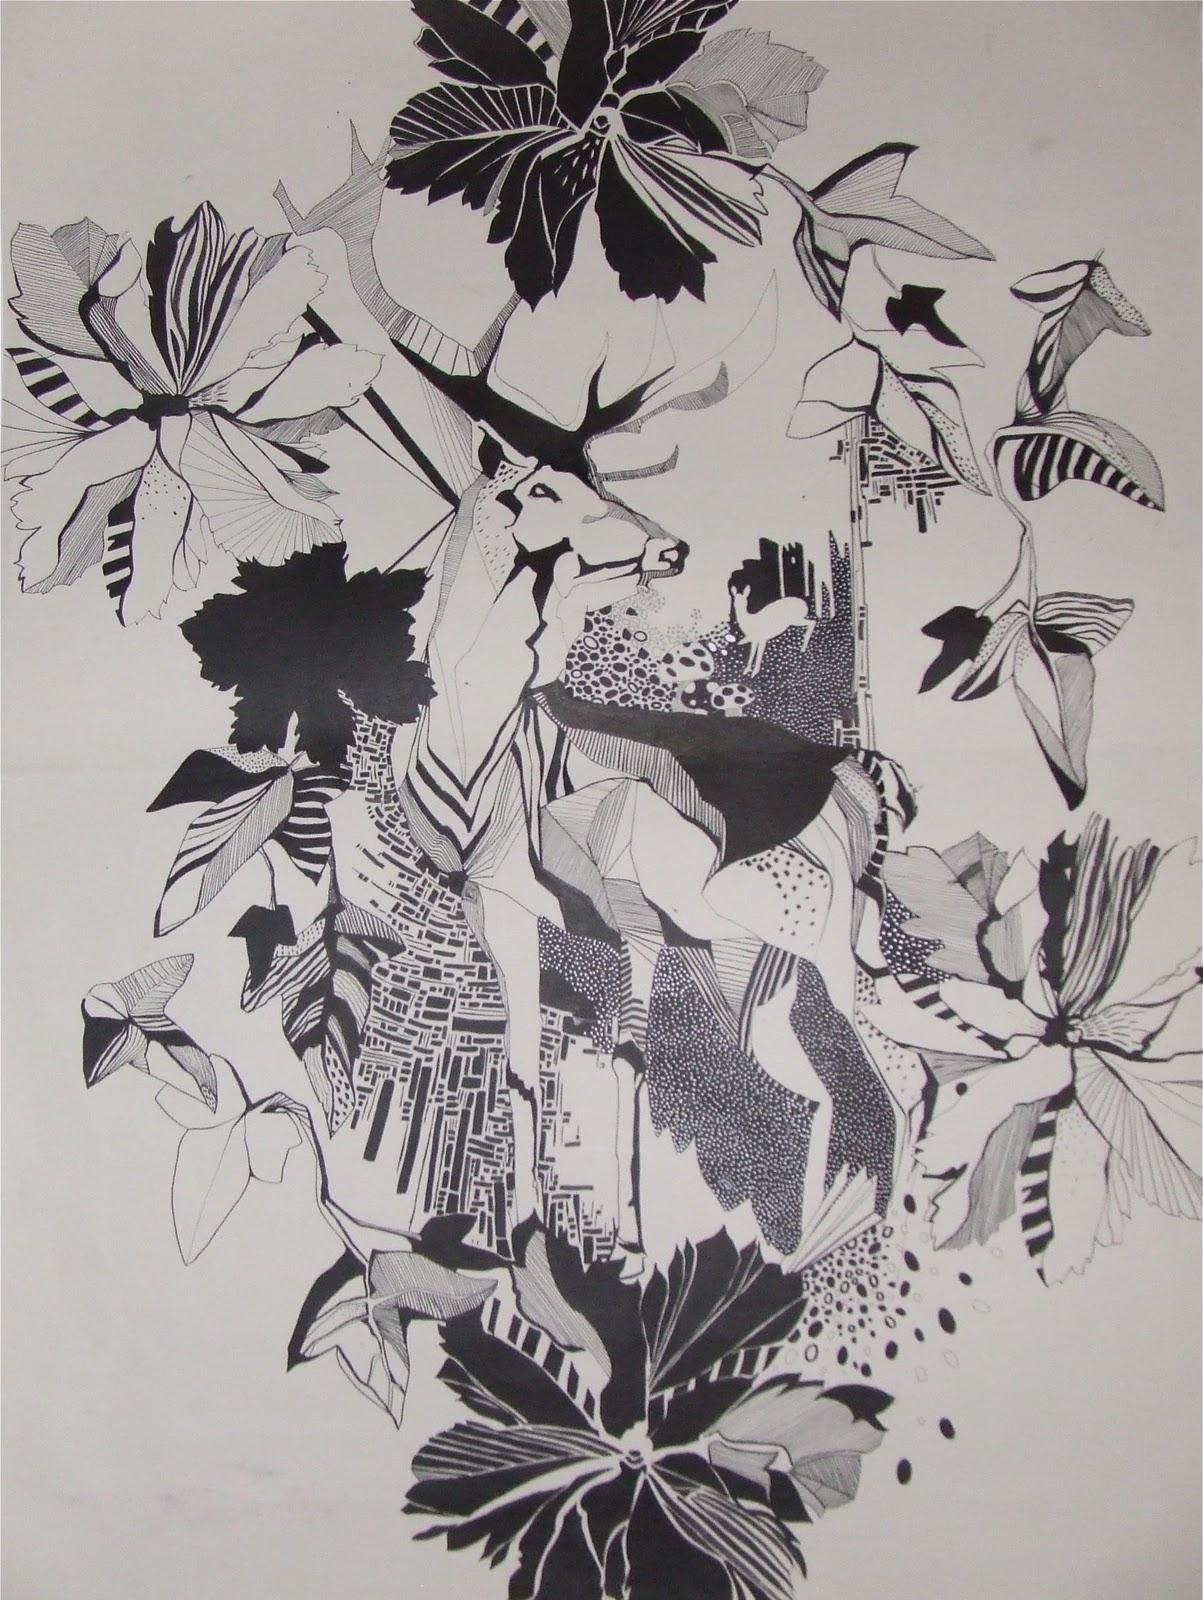 http://4.bp.blogspot.com/-As_BTKqCrWw/UEudoRZtNxI/AAAAAAAAAHU/ZU4OV7JD4d4/s1600/Preliminery+drawing+for+Stag+Wallpaper.jpg